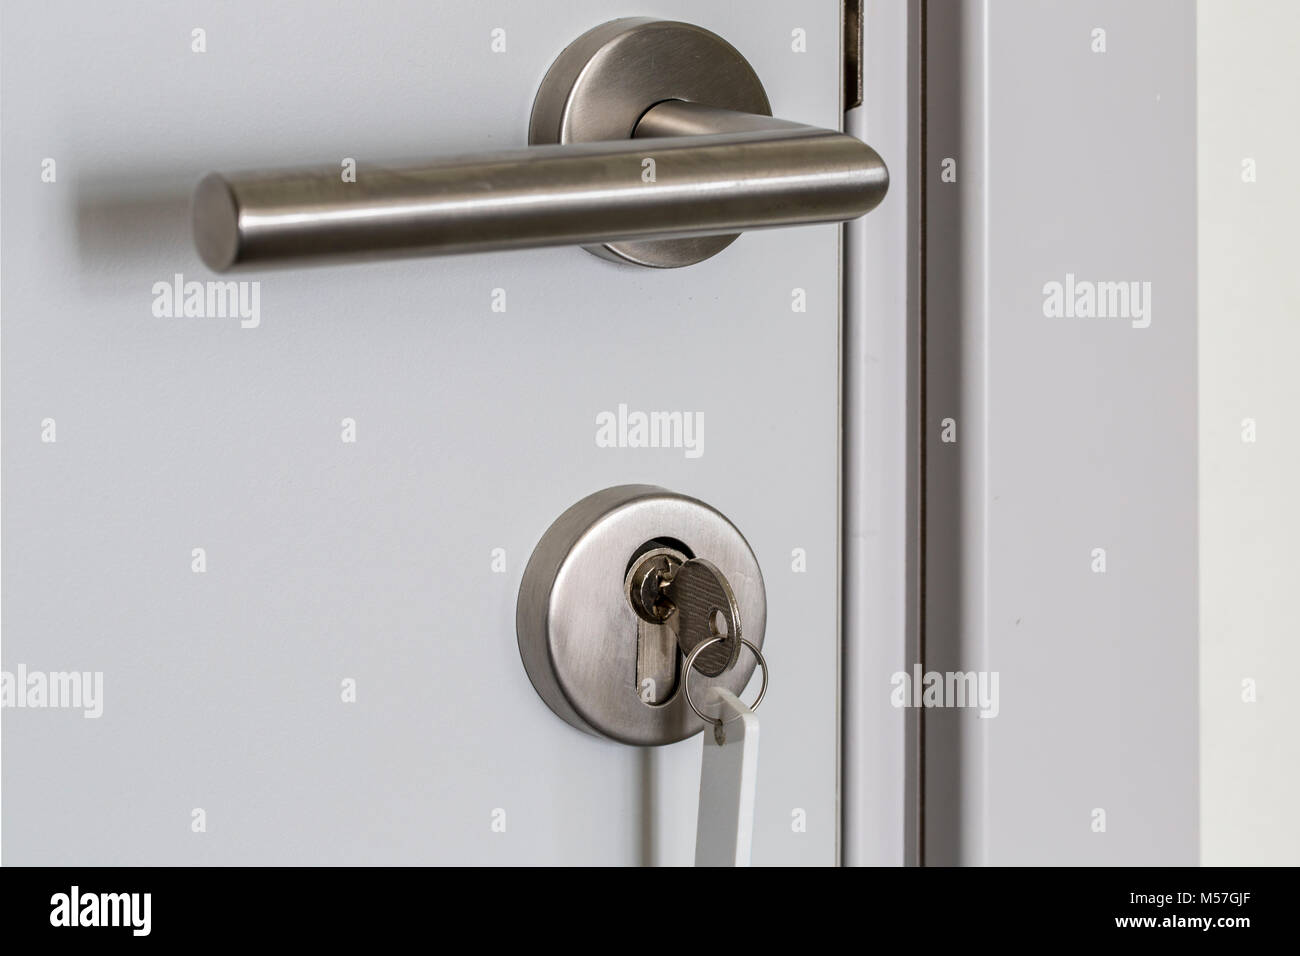 Gentil Key In Keyhole On Door   Stock Image